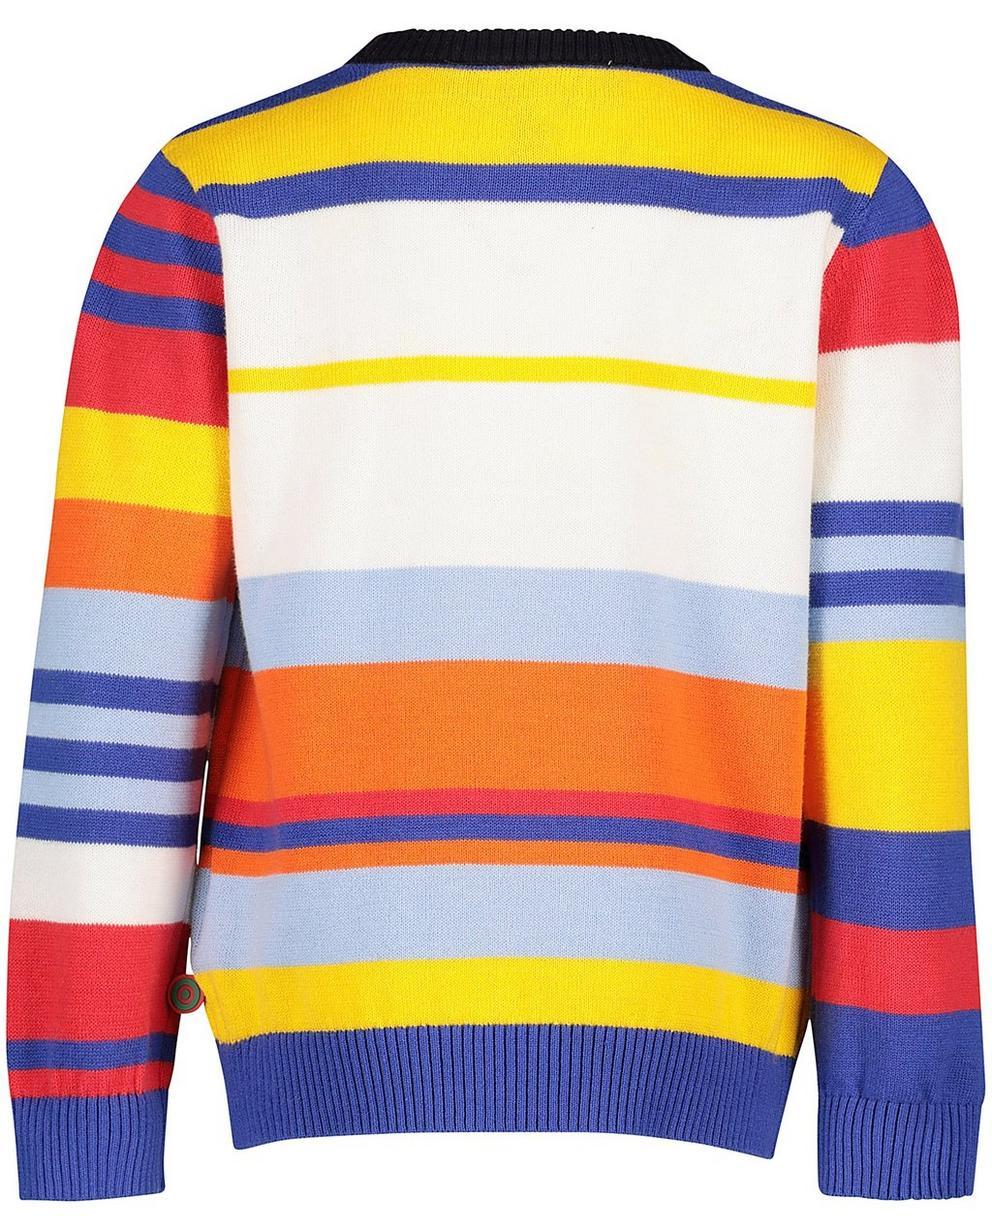 Truien - ASM - Kleurrijk gestreepte trui